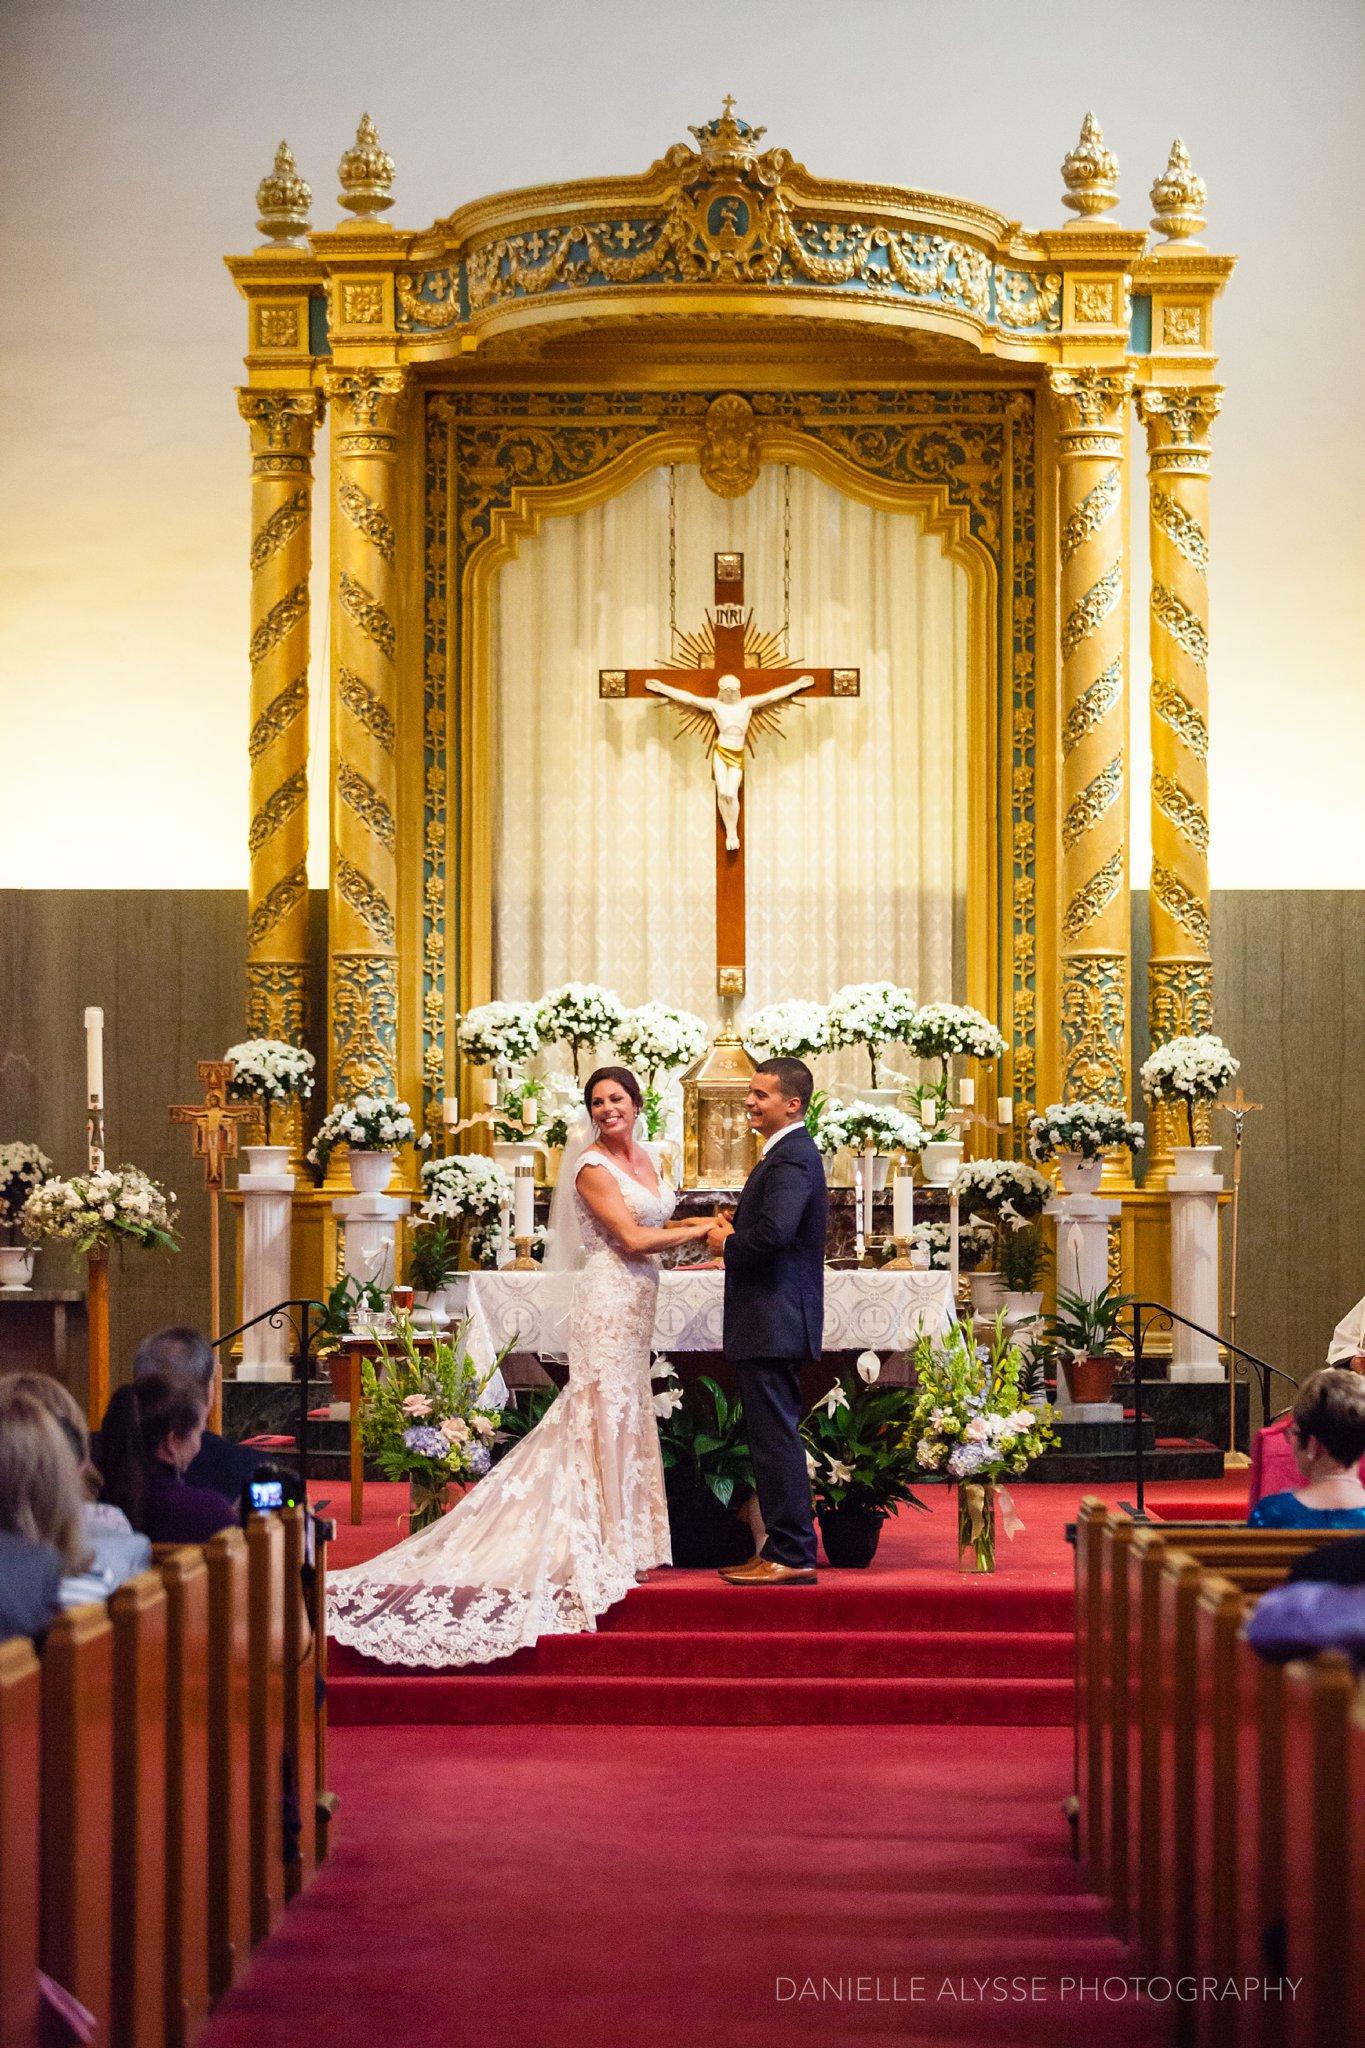 170429_blog_kimberly_ben_wedding_san_mateo_curiodyssey_danielle_alysse_photography_sacramento_photographer0547_WEB.jpg